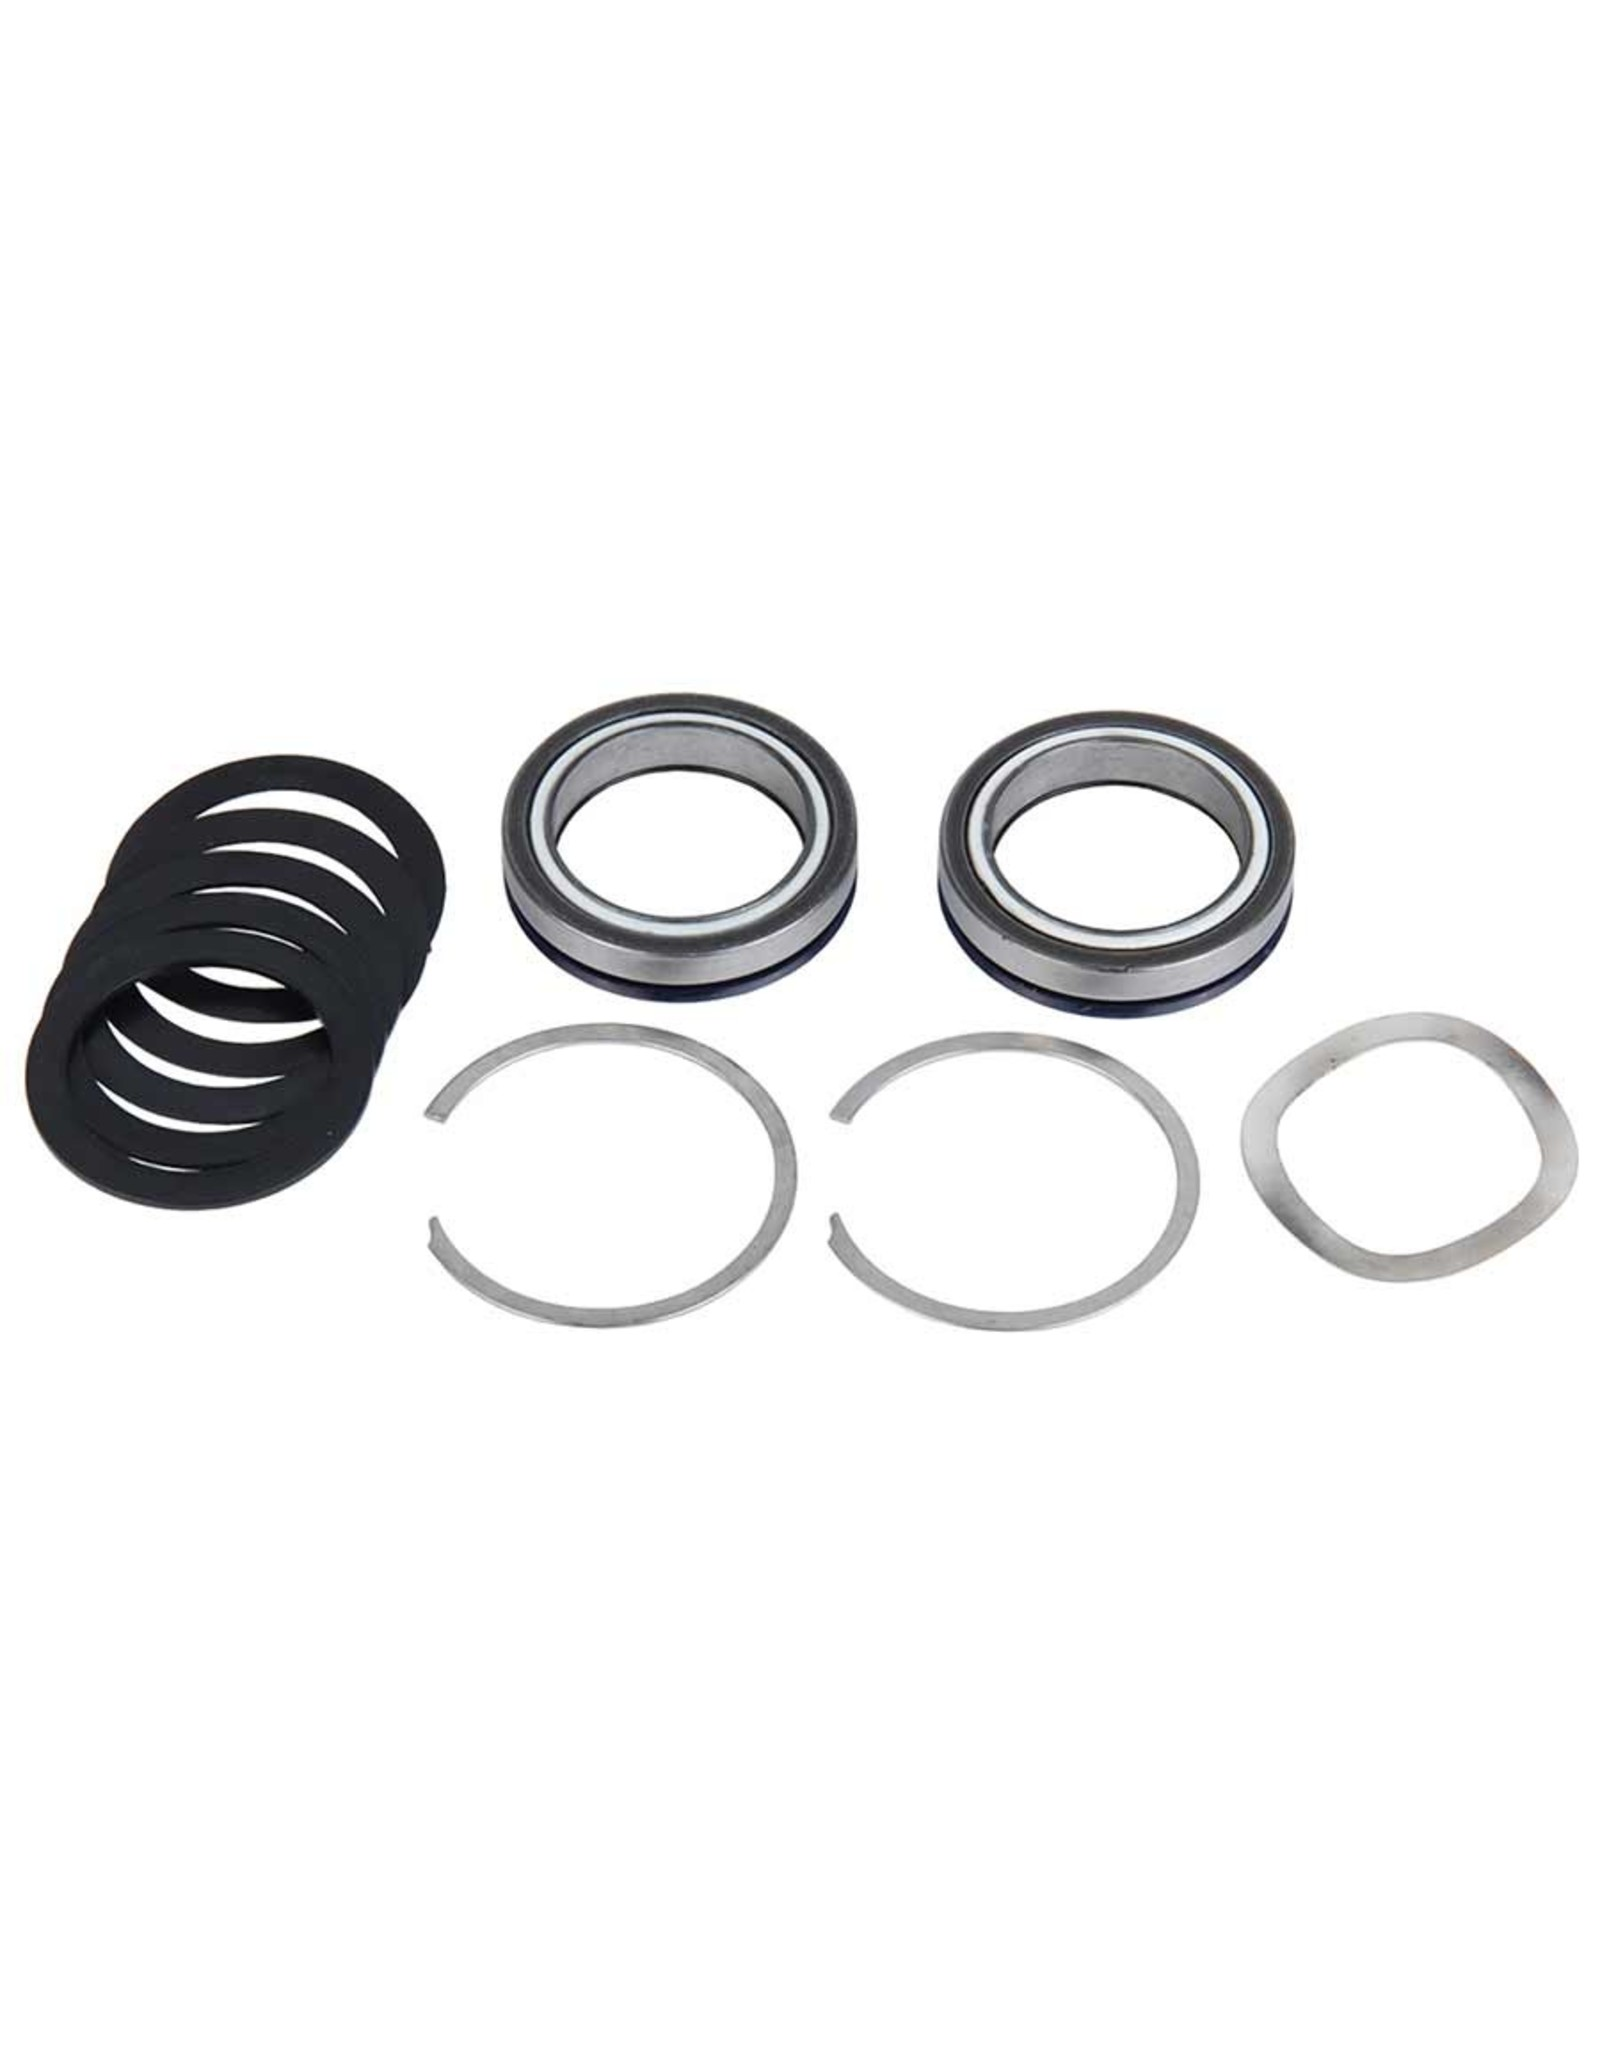 Enduro Enduro, XD-15, Hybrid ceramic bearing kit, BB30, With seals and washers